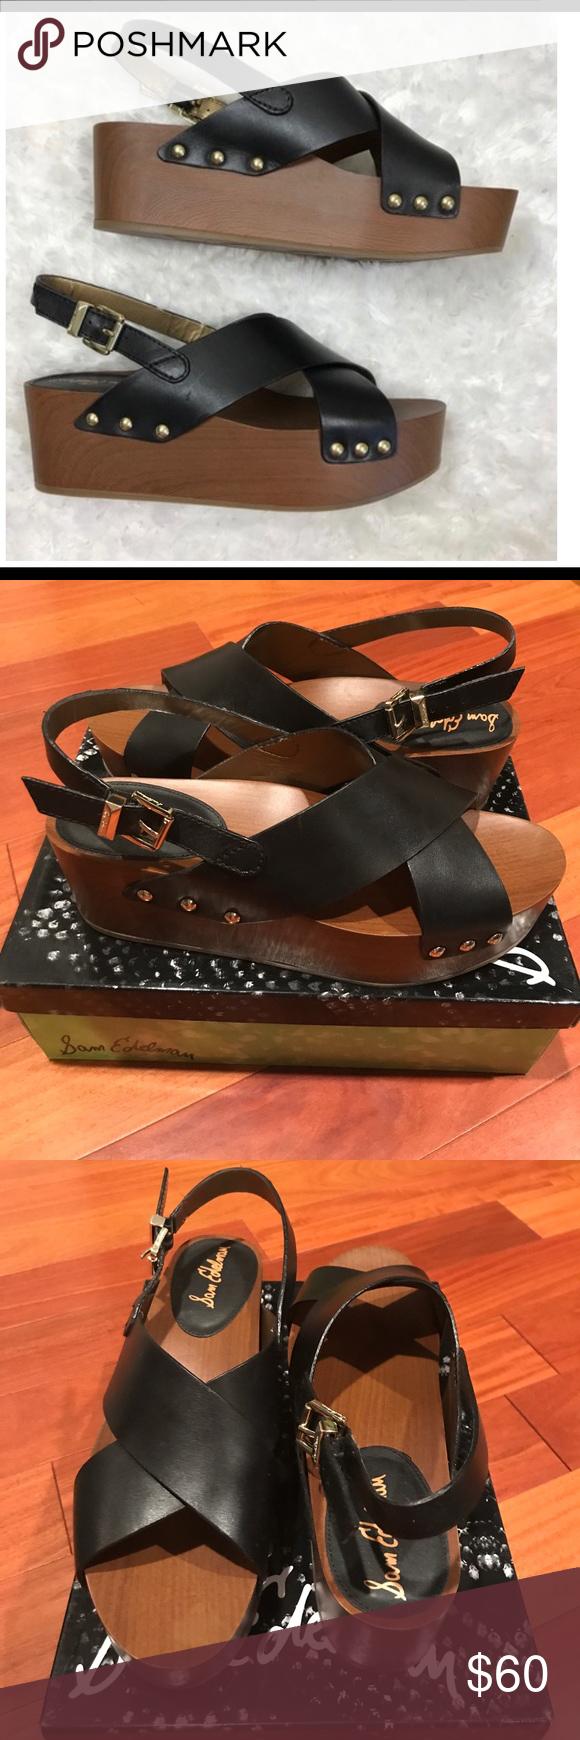 cd31f45dd29 Sam Edelman Bentlee Platform Sandals These platform sandals have a  retro-chic look. Leather